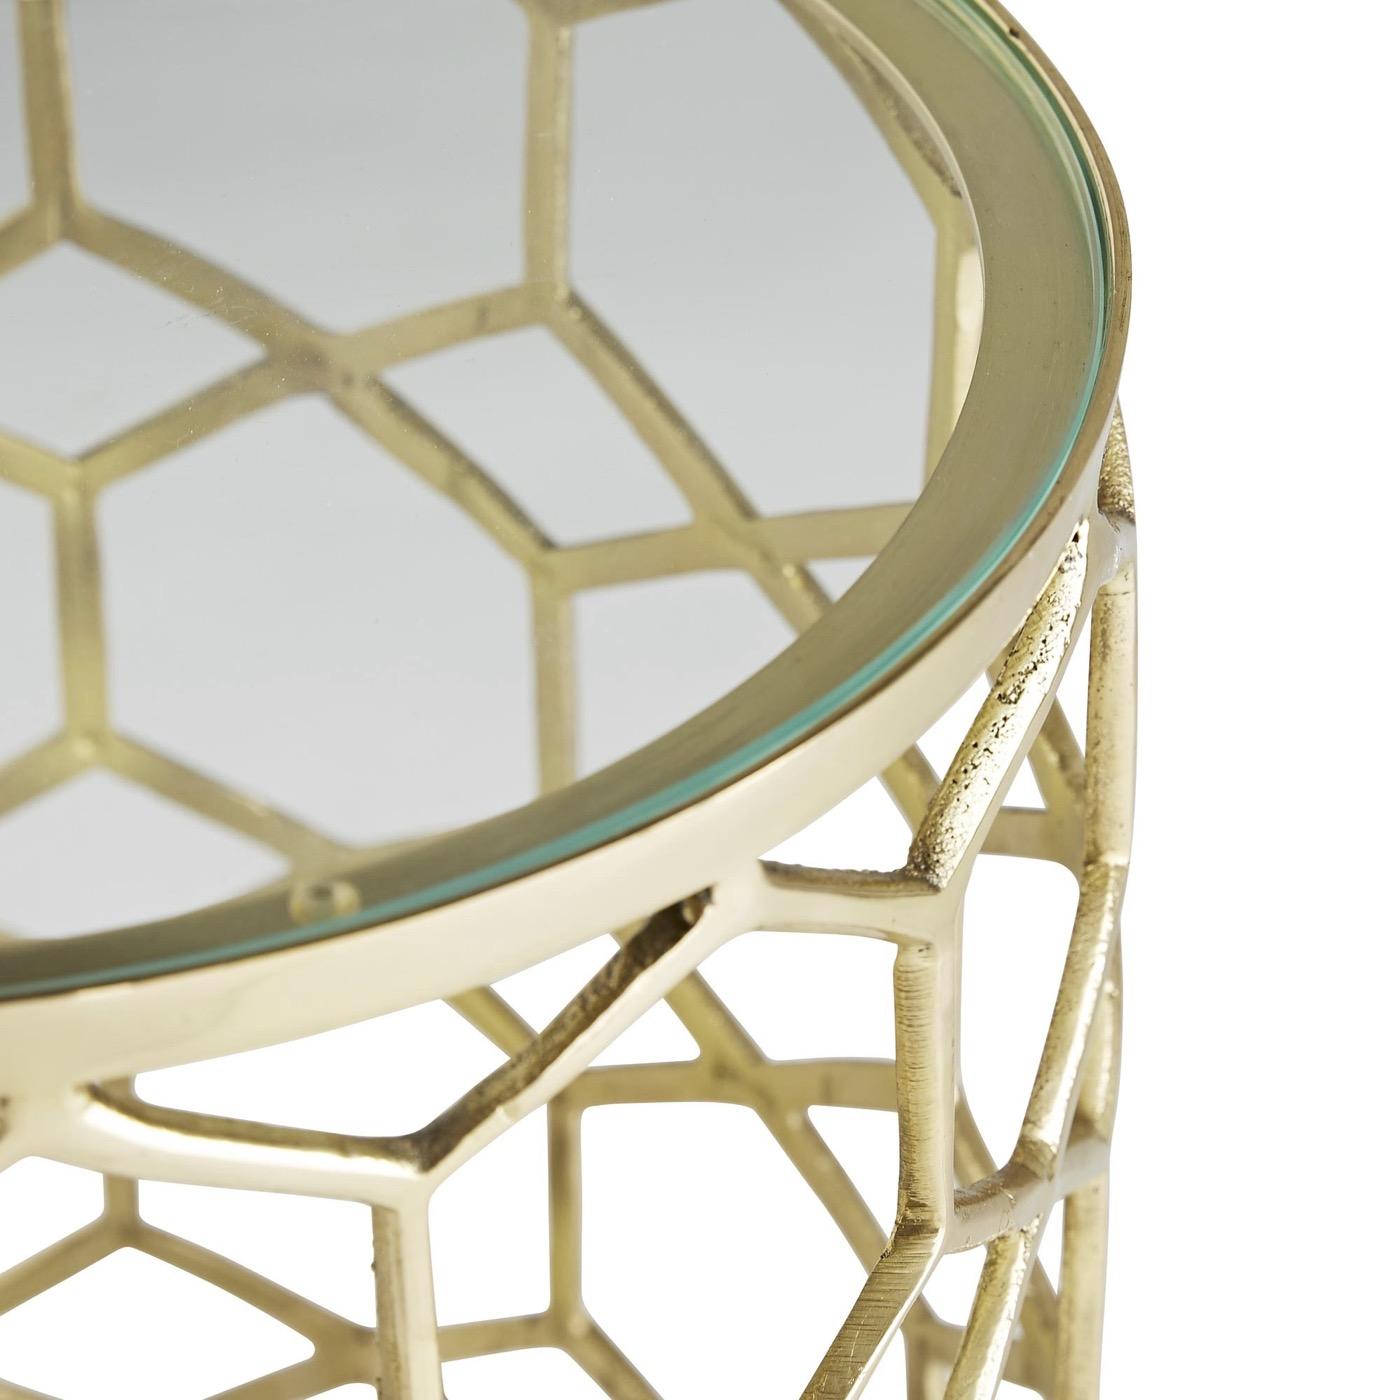 Lombardy Brass Side Table